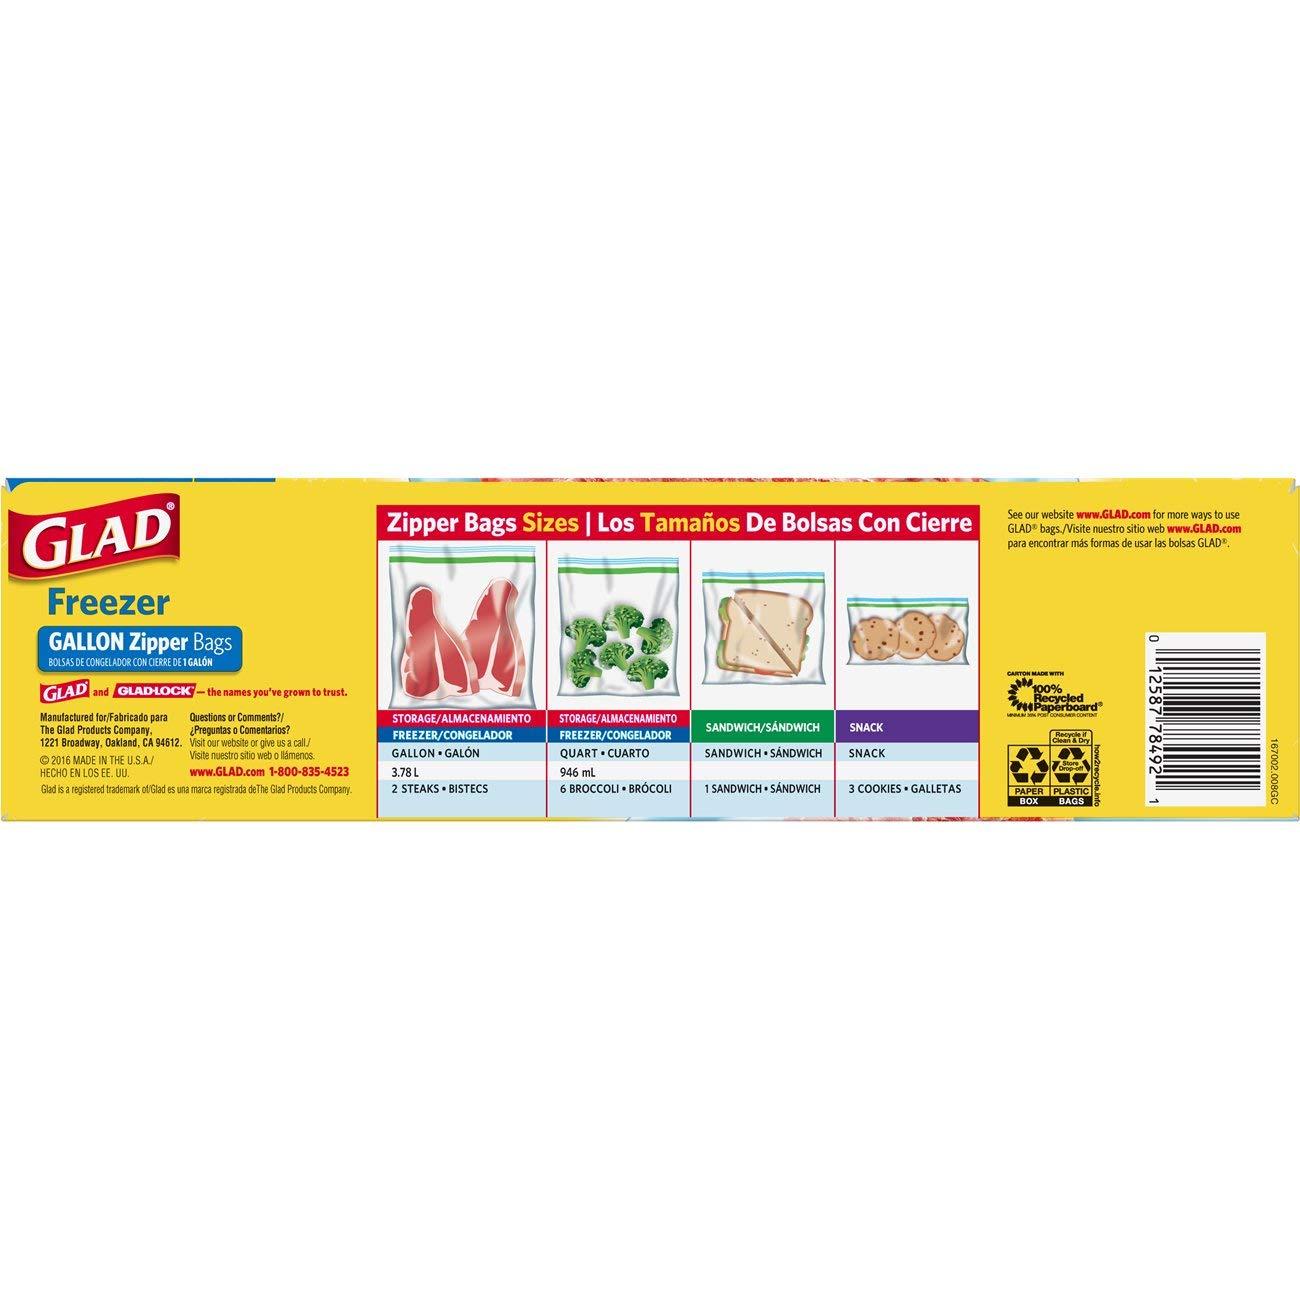 Amazon.com: Glad Zipper Food Storage Freezer Bags - Gallon ...